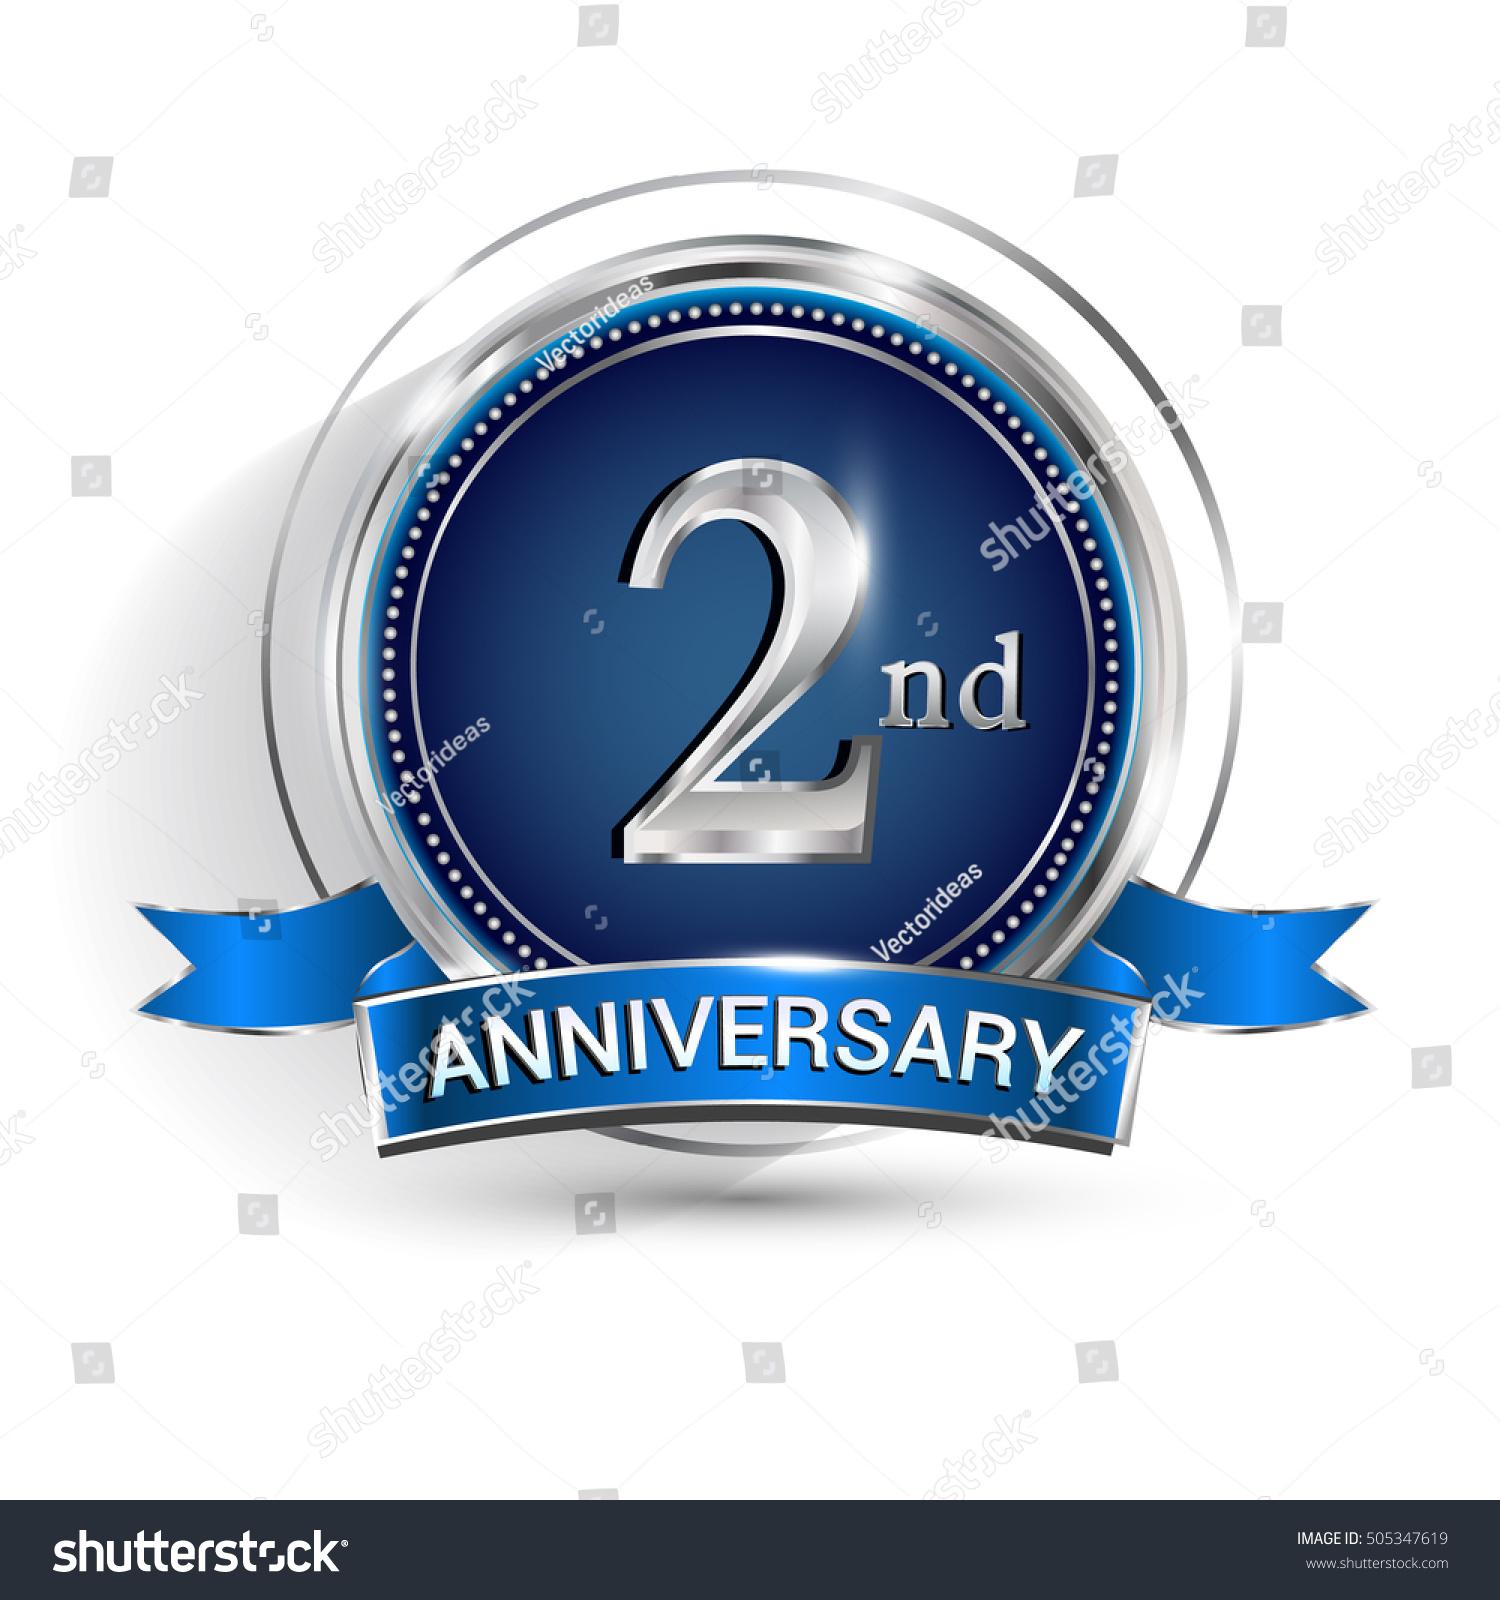 Celebrating nd anniversary logo silver ring stock vector